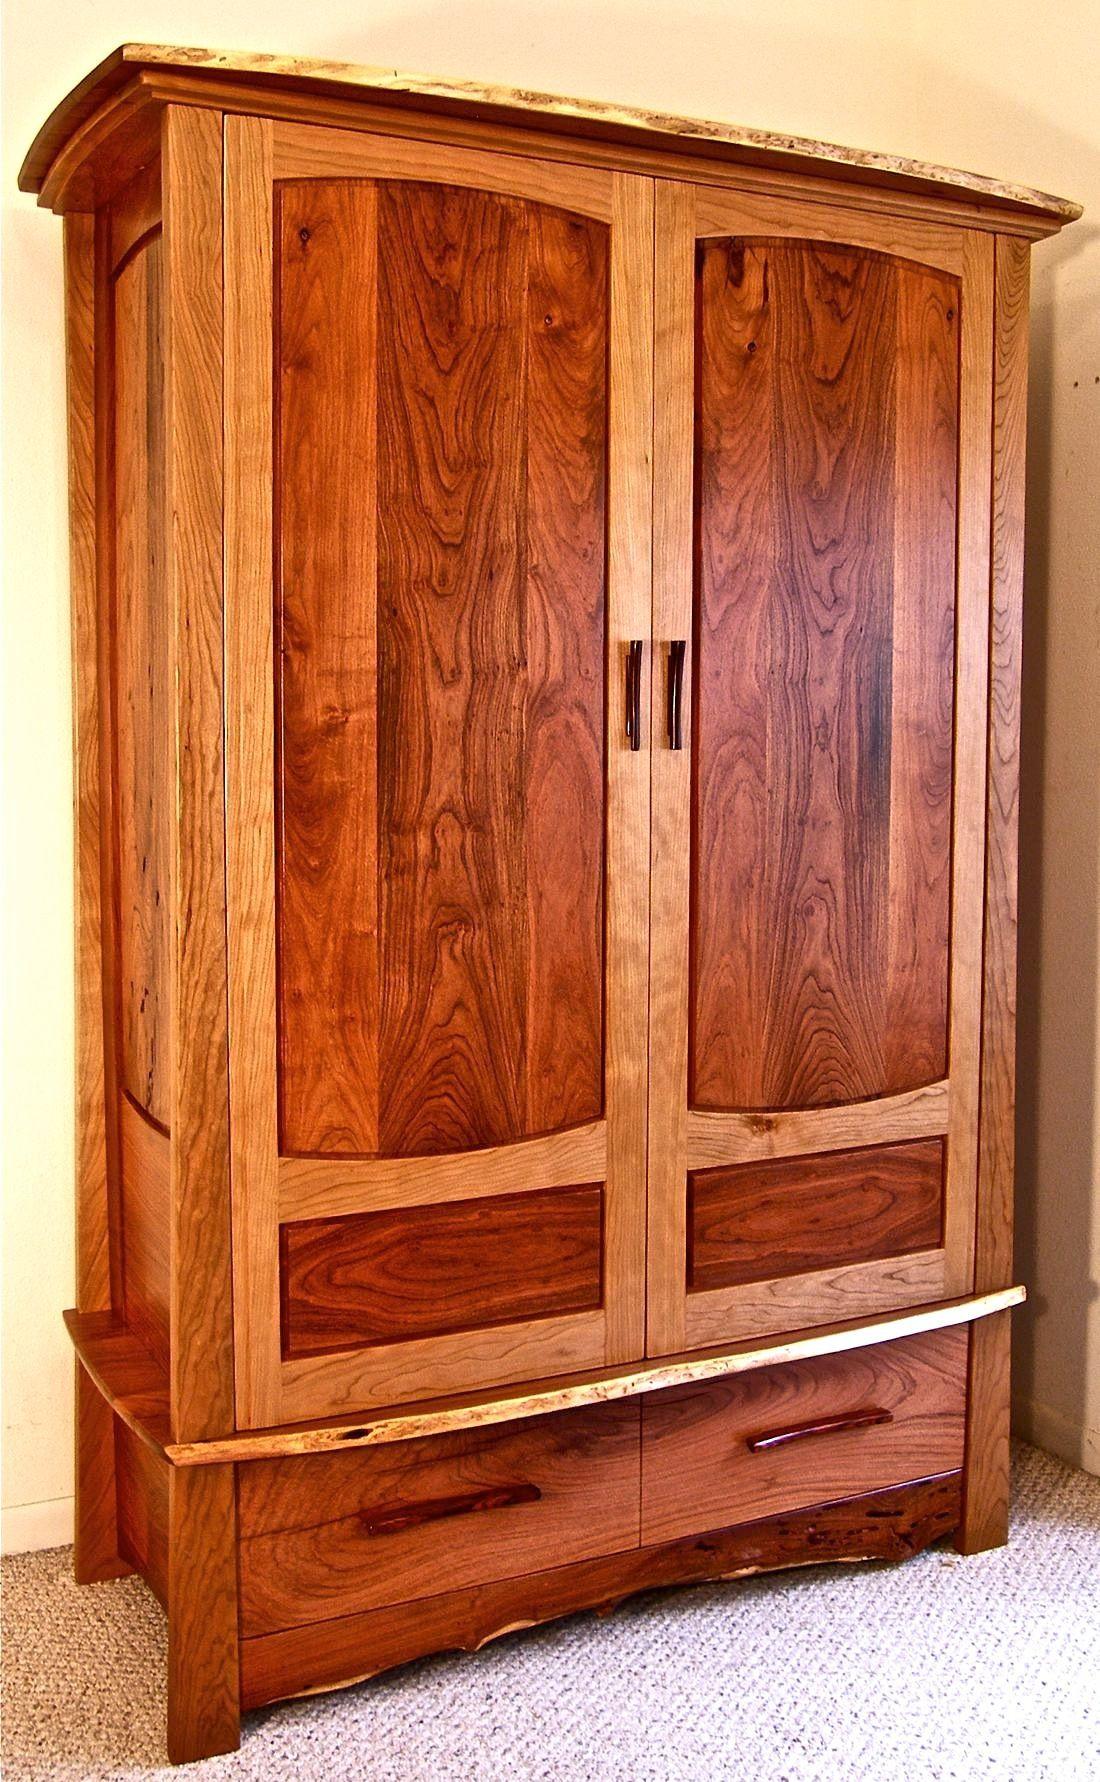 Merveilleux Custom Handmade Armoire In Texas Mesquite U0026 Cherry